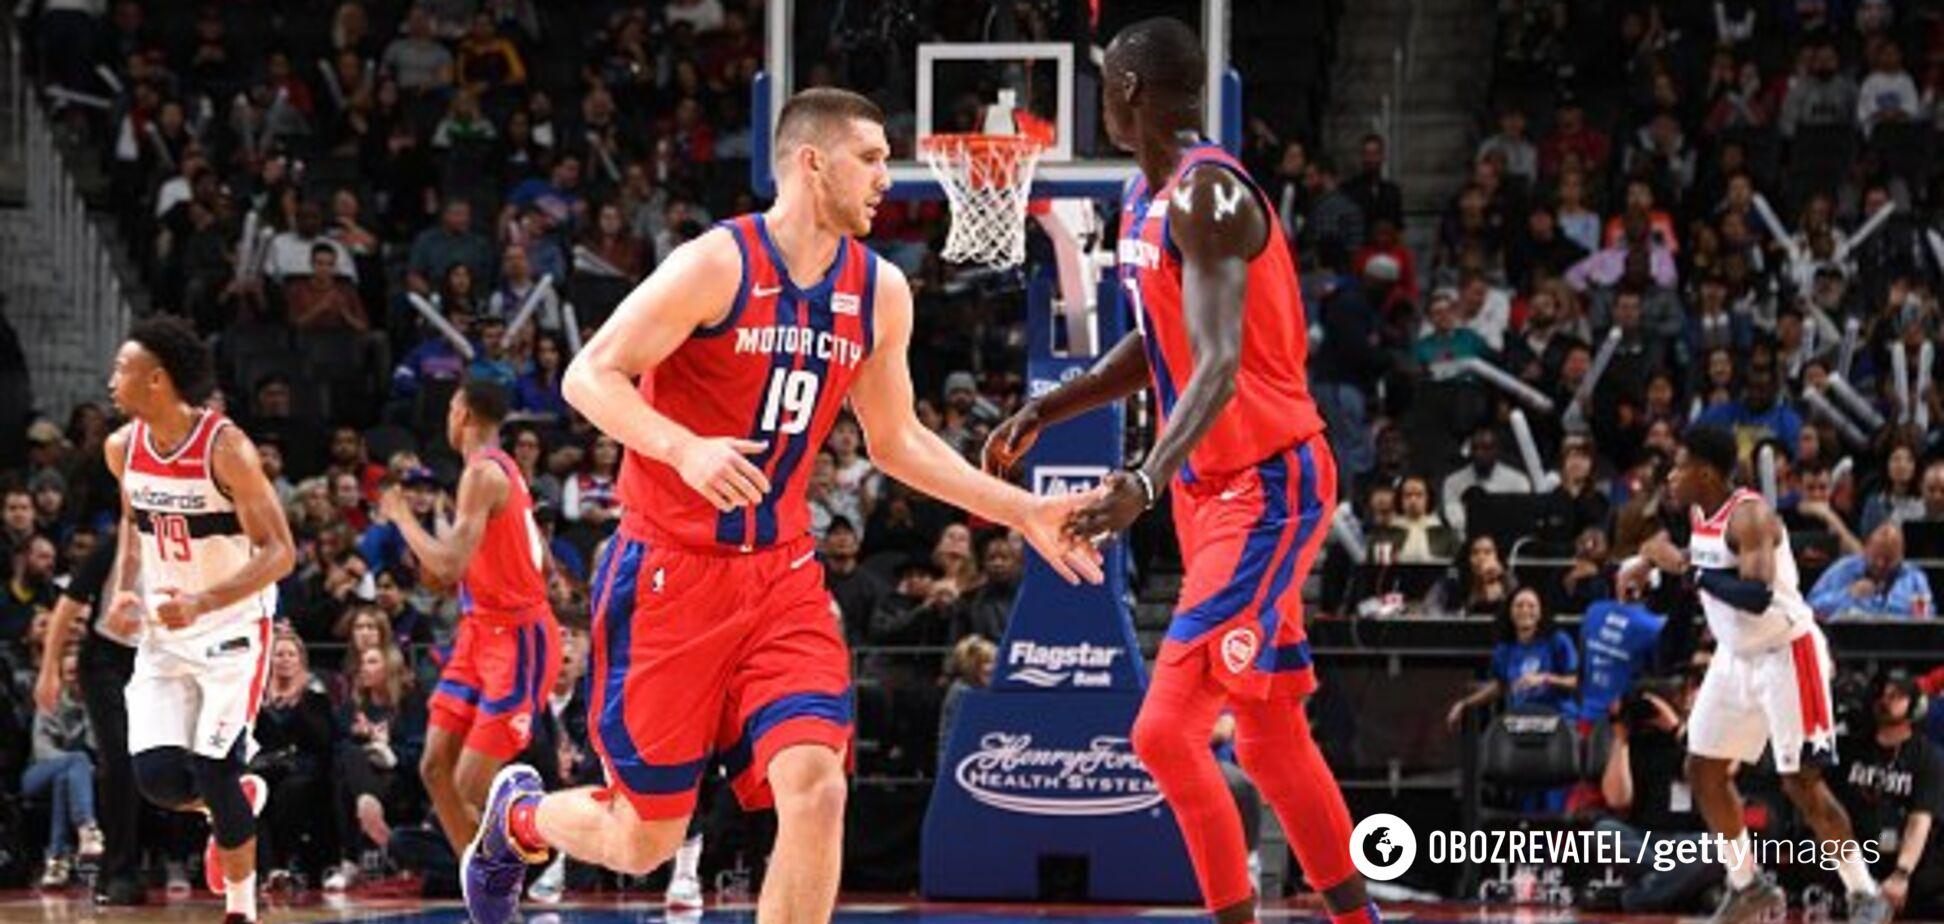 Українець Михайлюк показав яскраву гру в рекордному матчі НБА